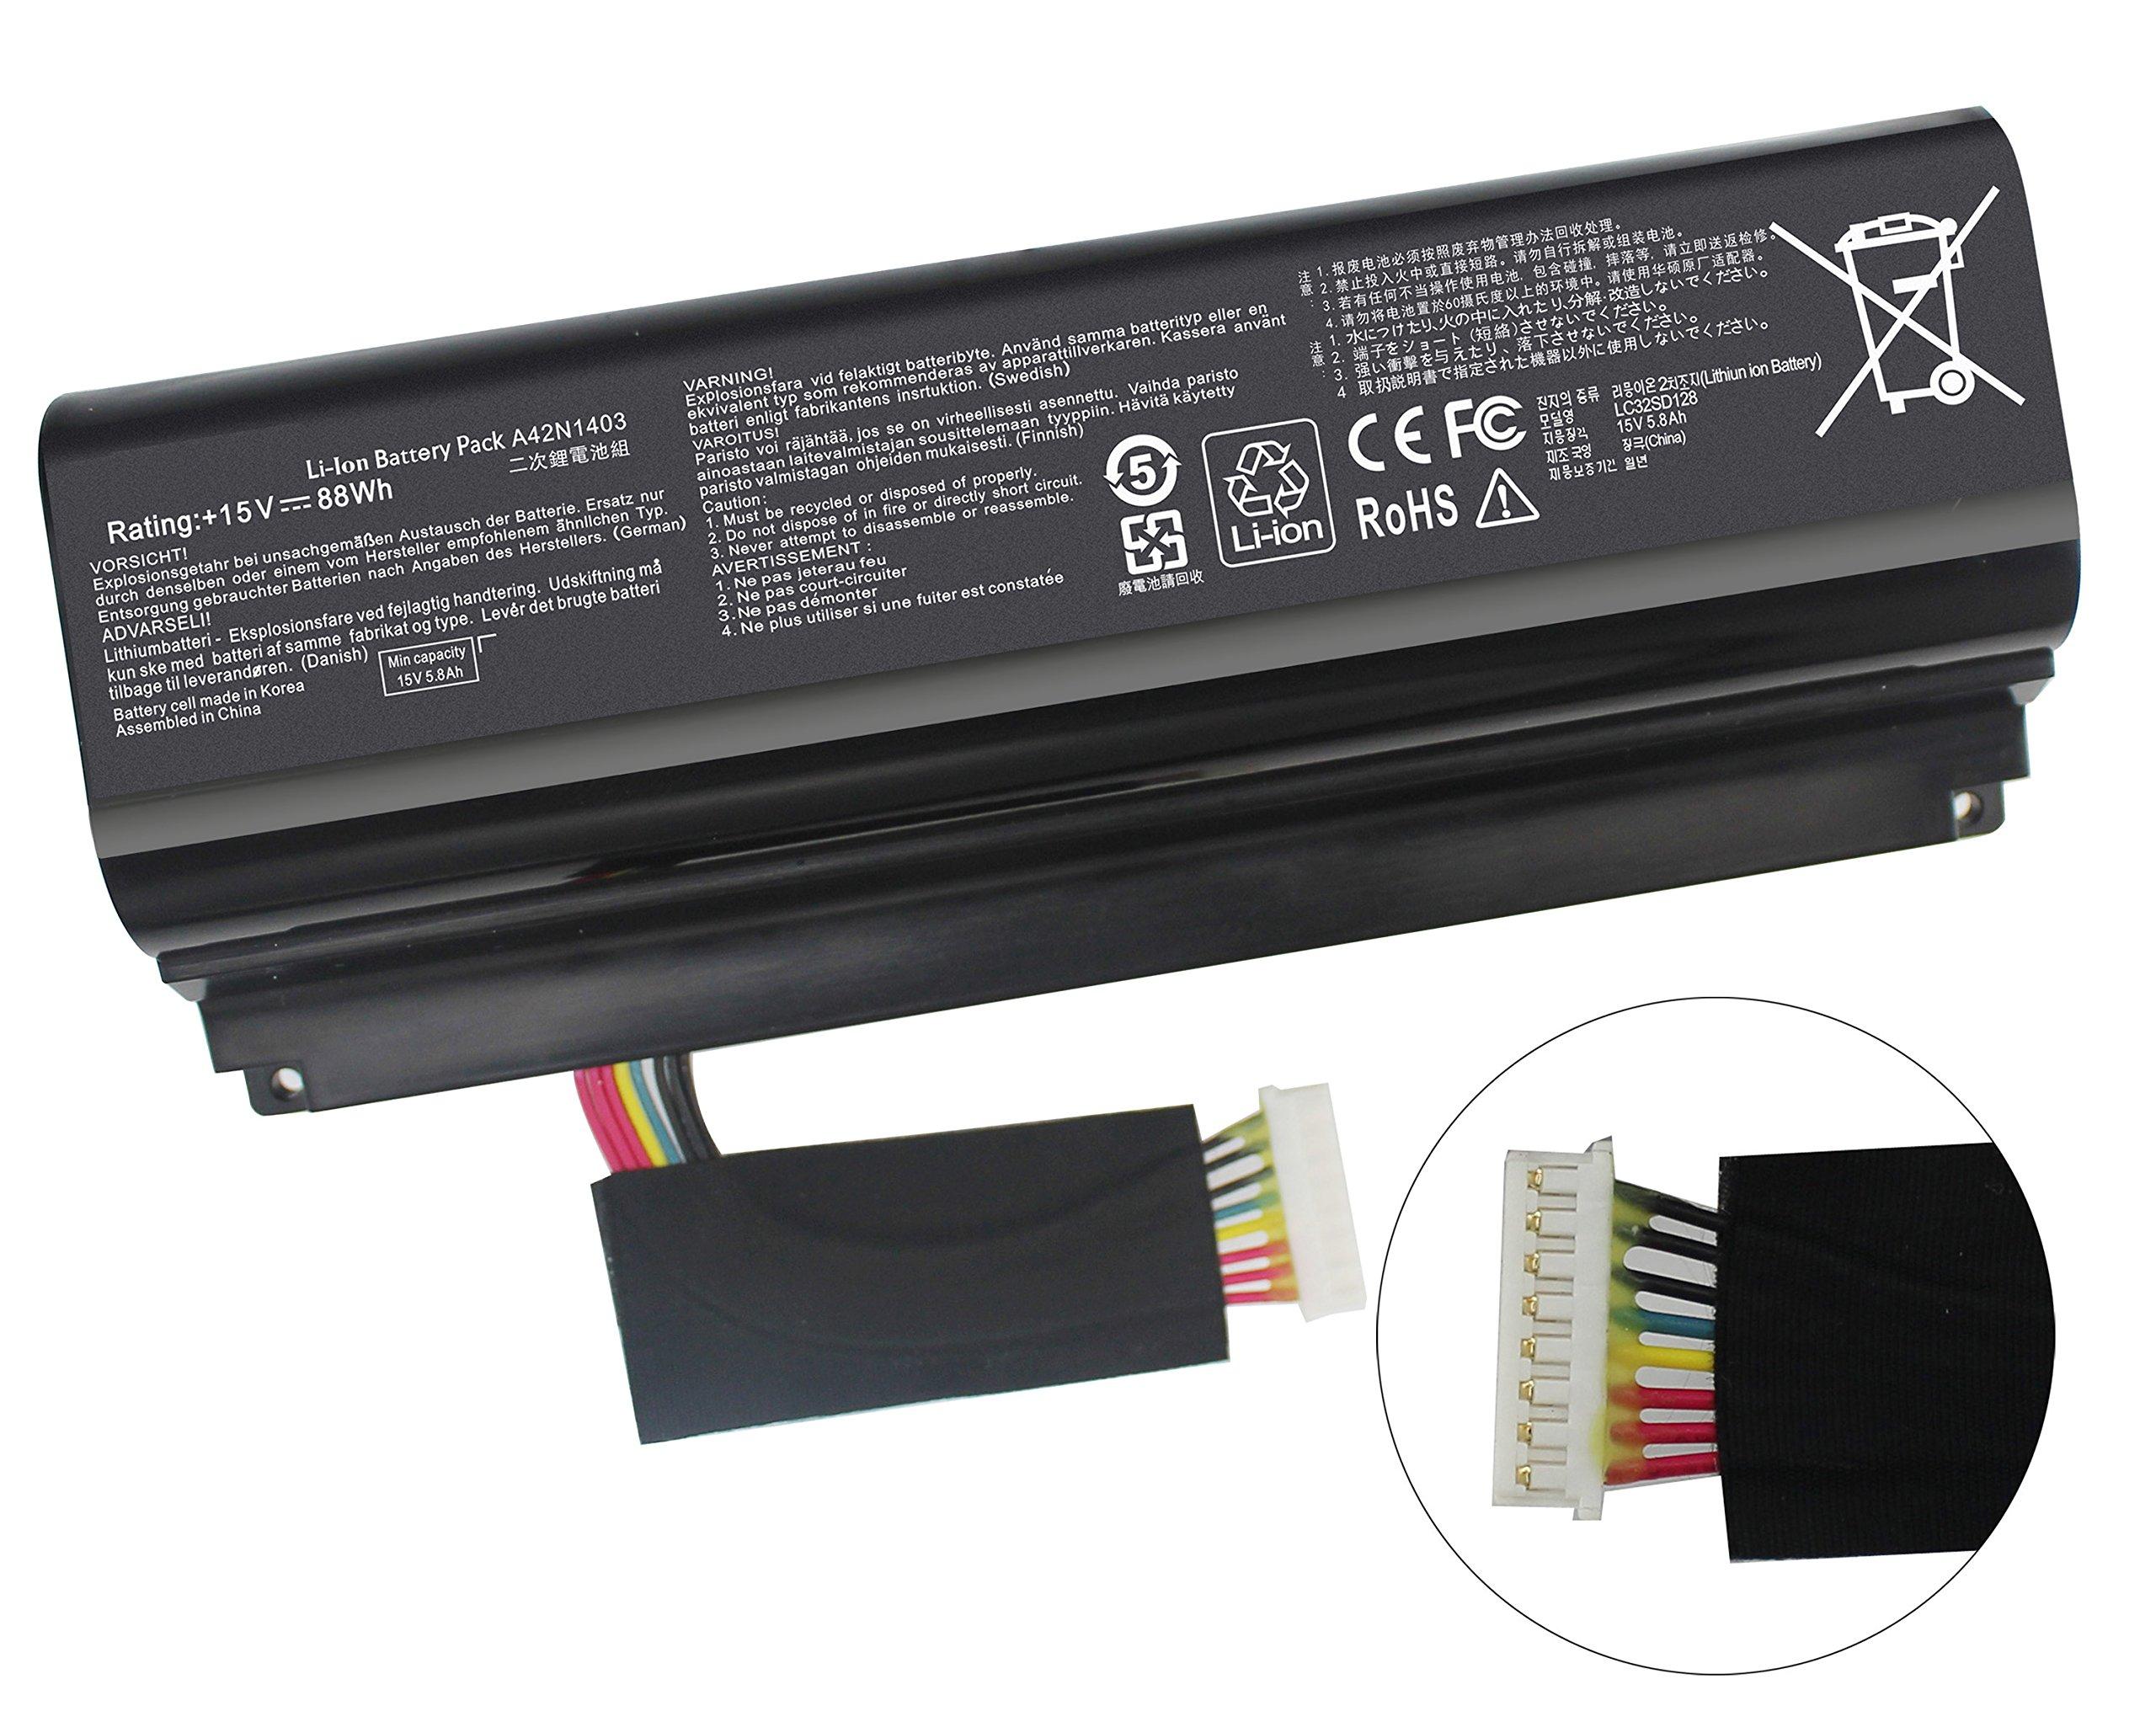 Gomarty New A42N1403 Battery for ASUS ROG GFX71JY 17.3'' GFX71JY4710 G751 G751J G751JT G751JY G751JL G751JM GFX71JY GFX71JY4710 GFX71JY4710 G751J-BHI7T25 G751JL-BSI7T28 A42LM93 0B110-00290000 4ICR19/66